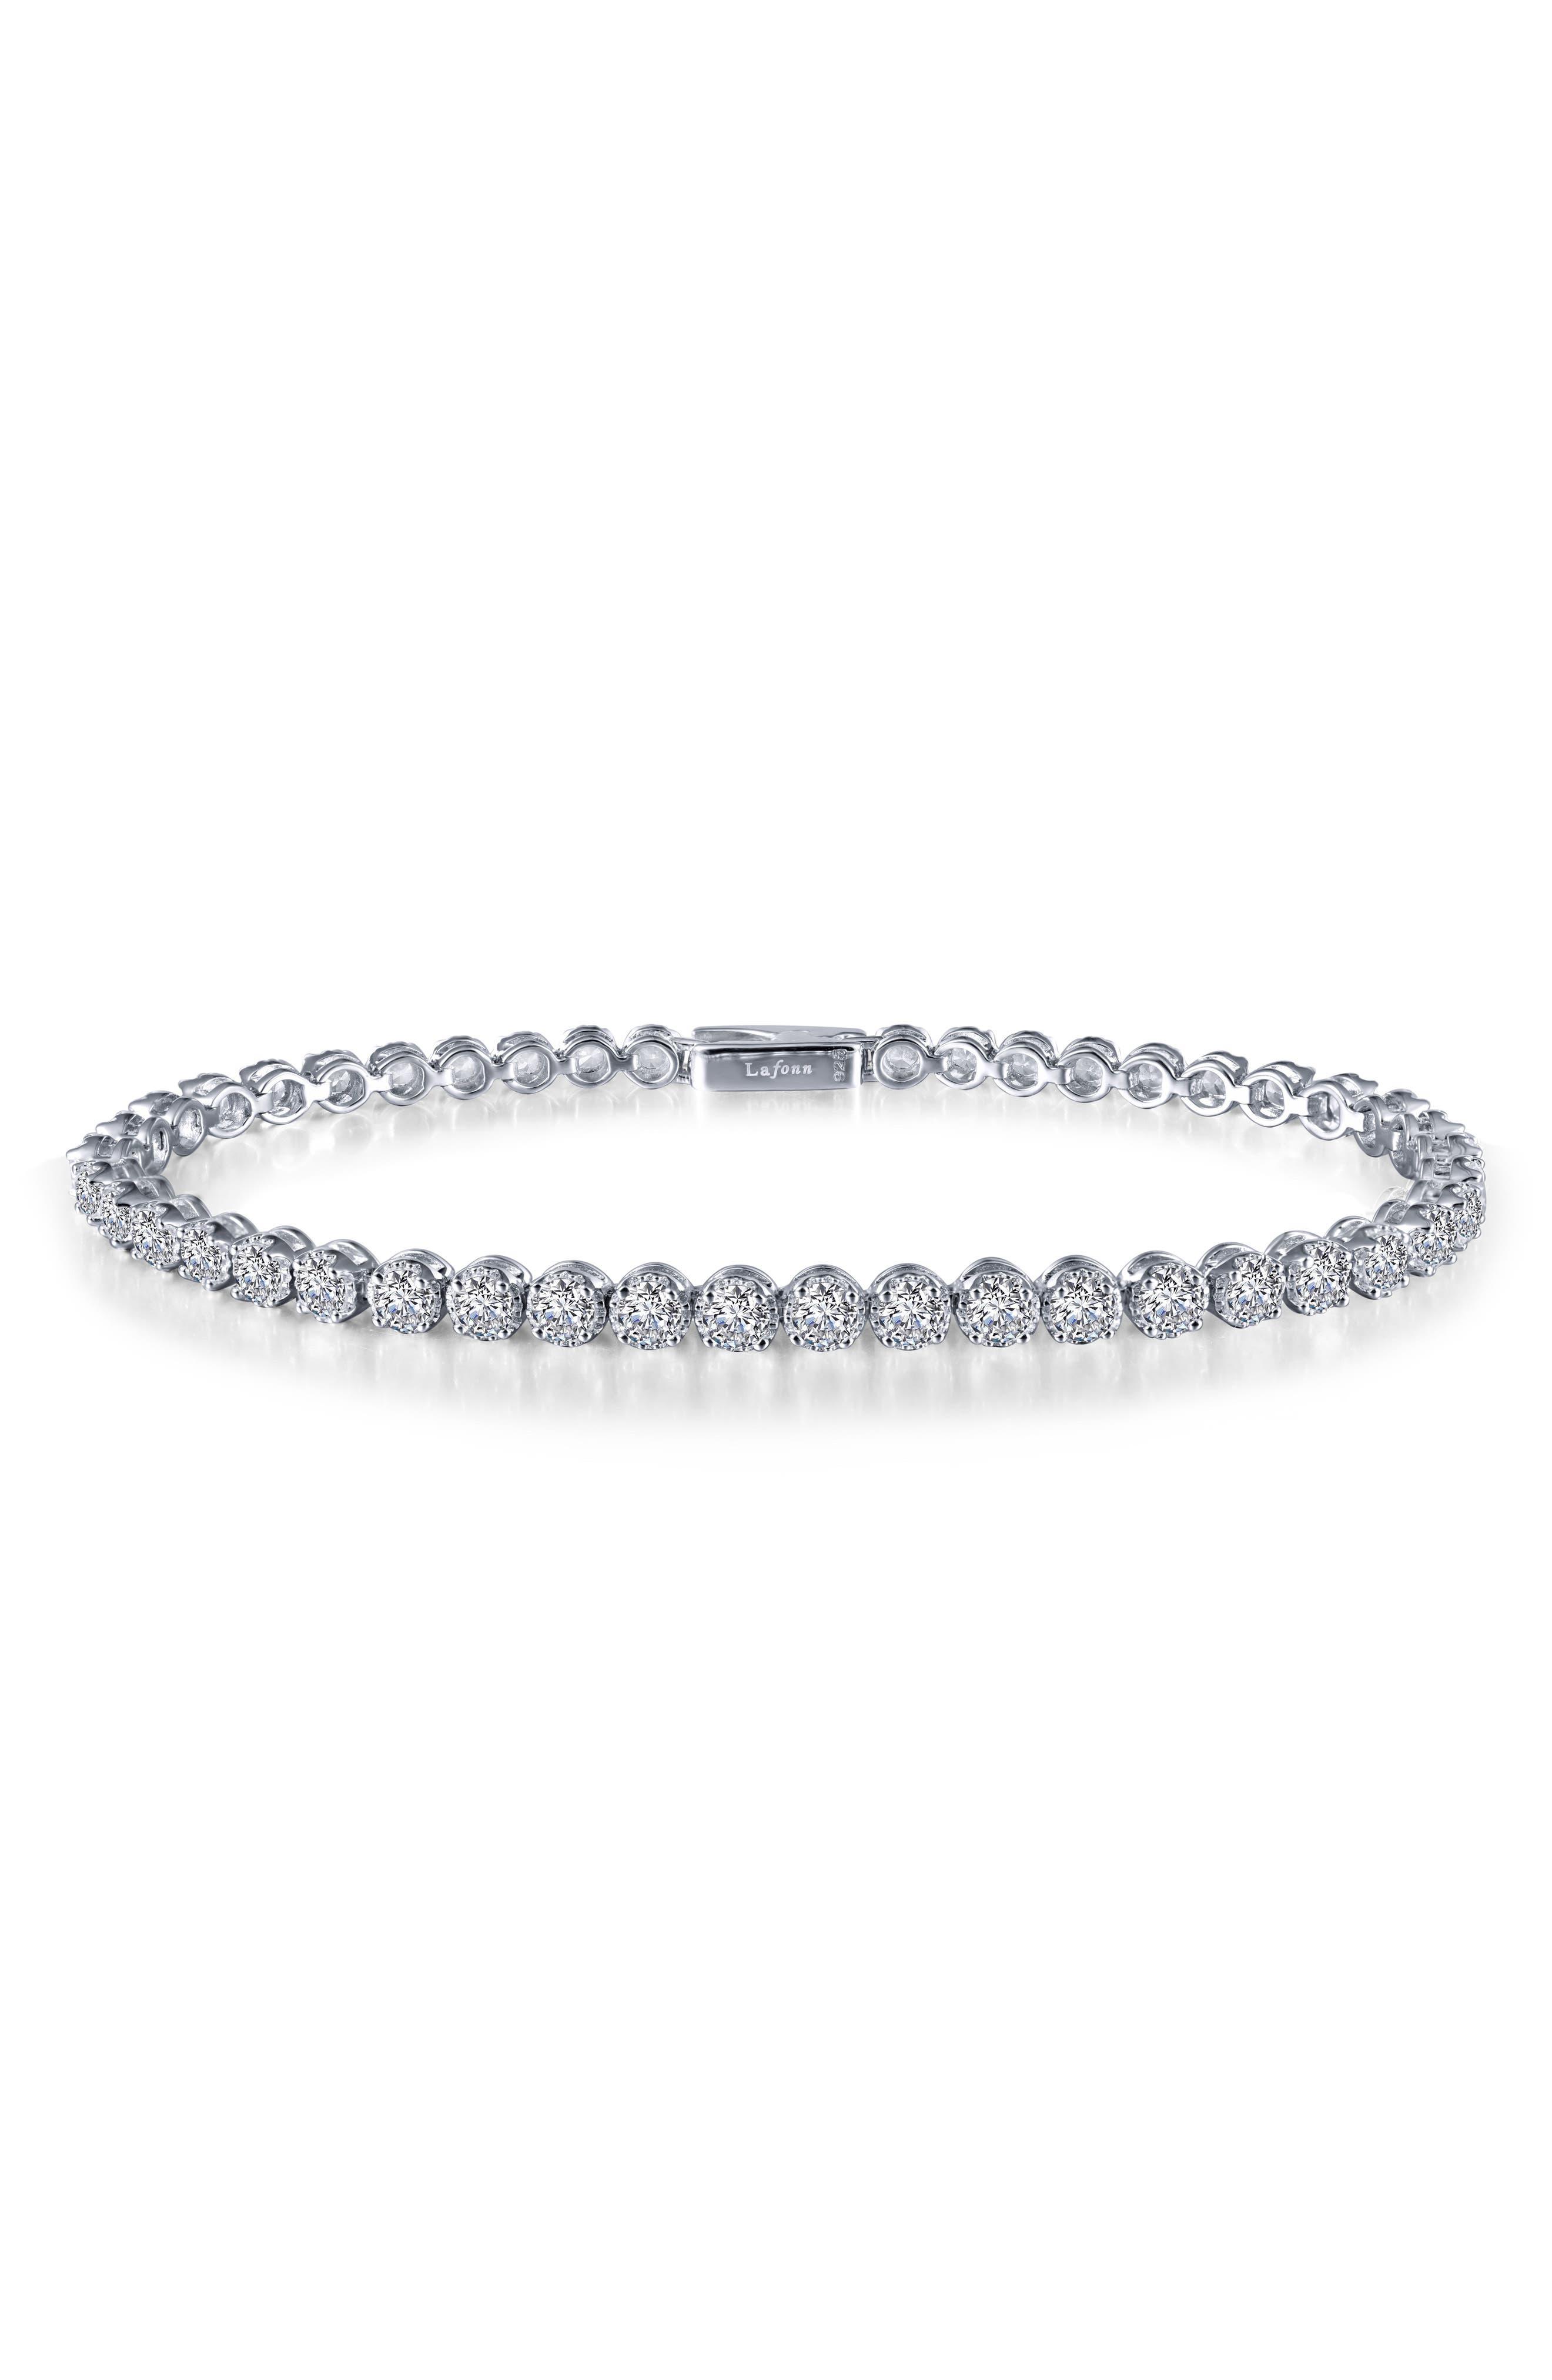 Simulated Diamond Tennis Bracelet,                         Main,                         color, Silver/ Clear